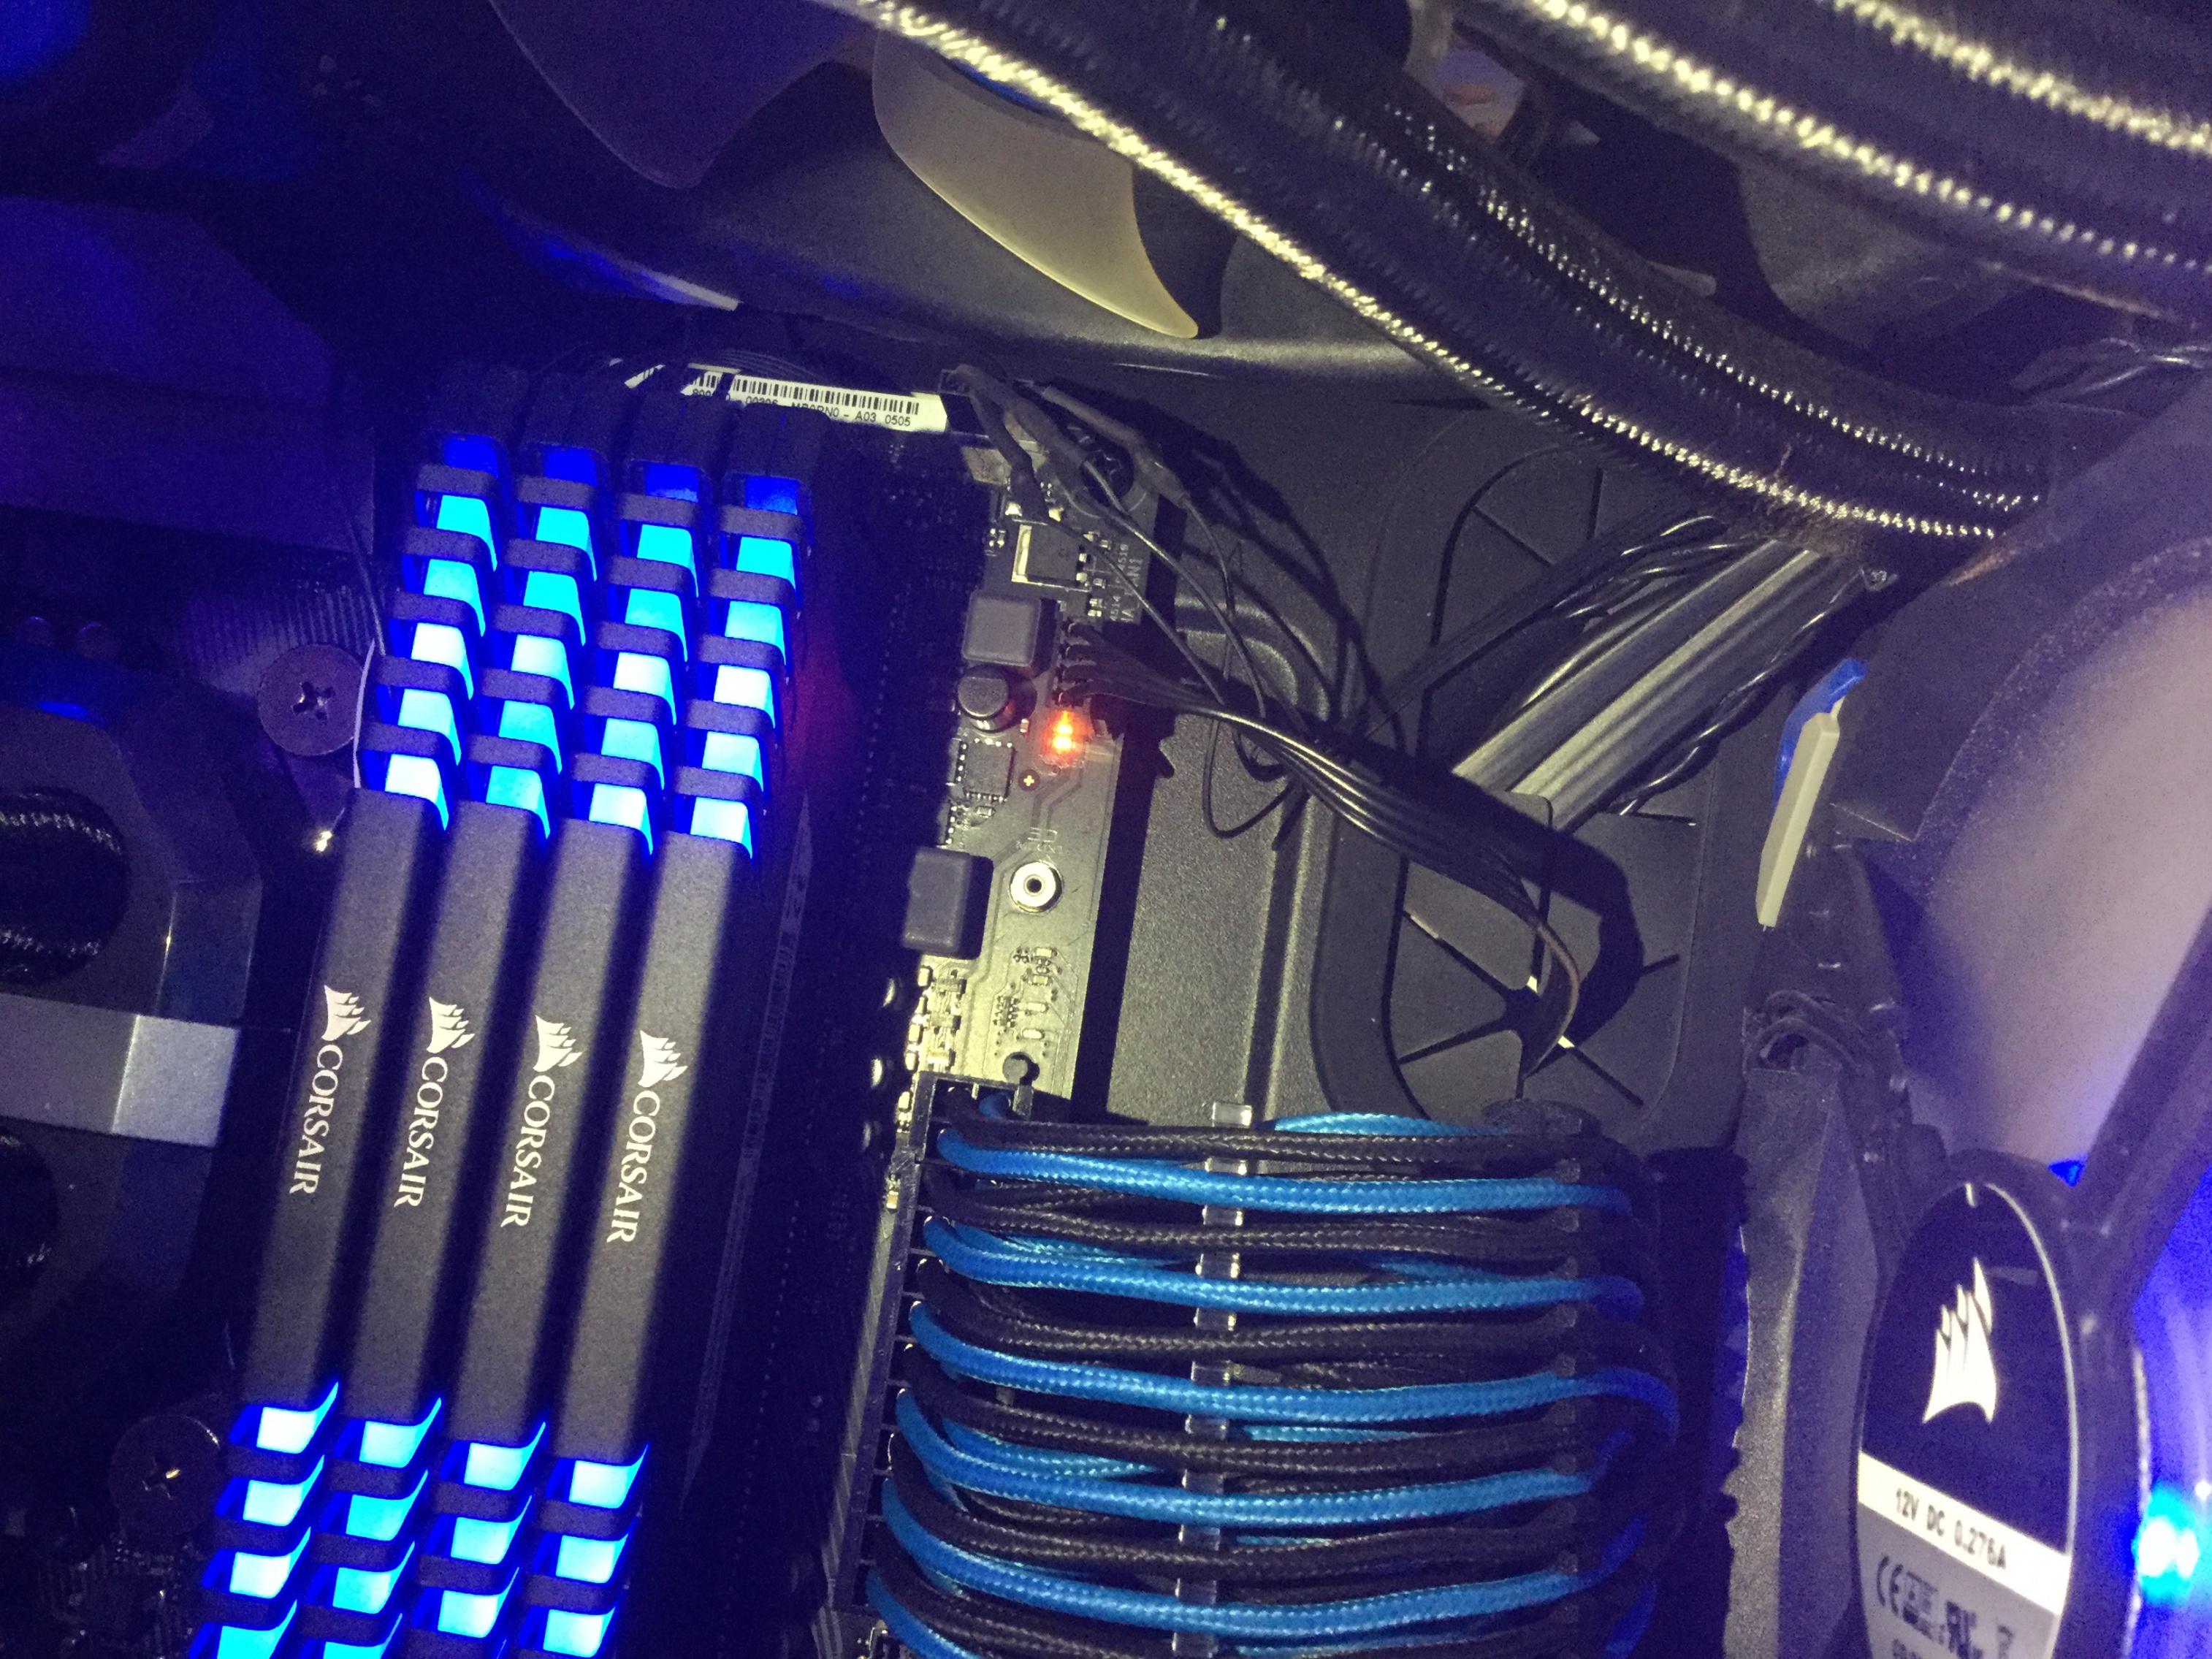 Hilfe zu RGB-LEDs und Asus Aura